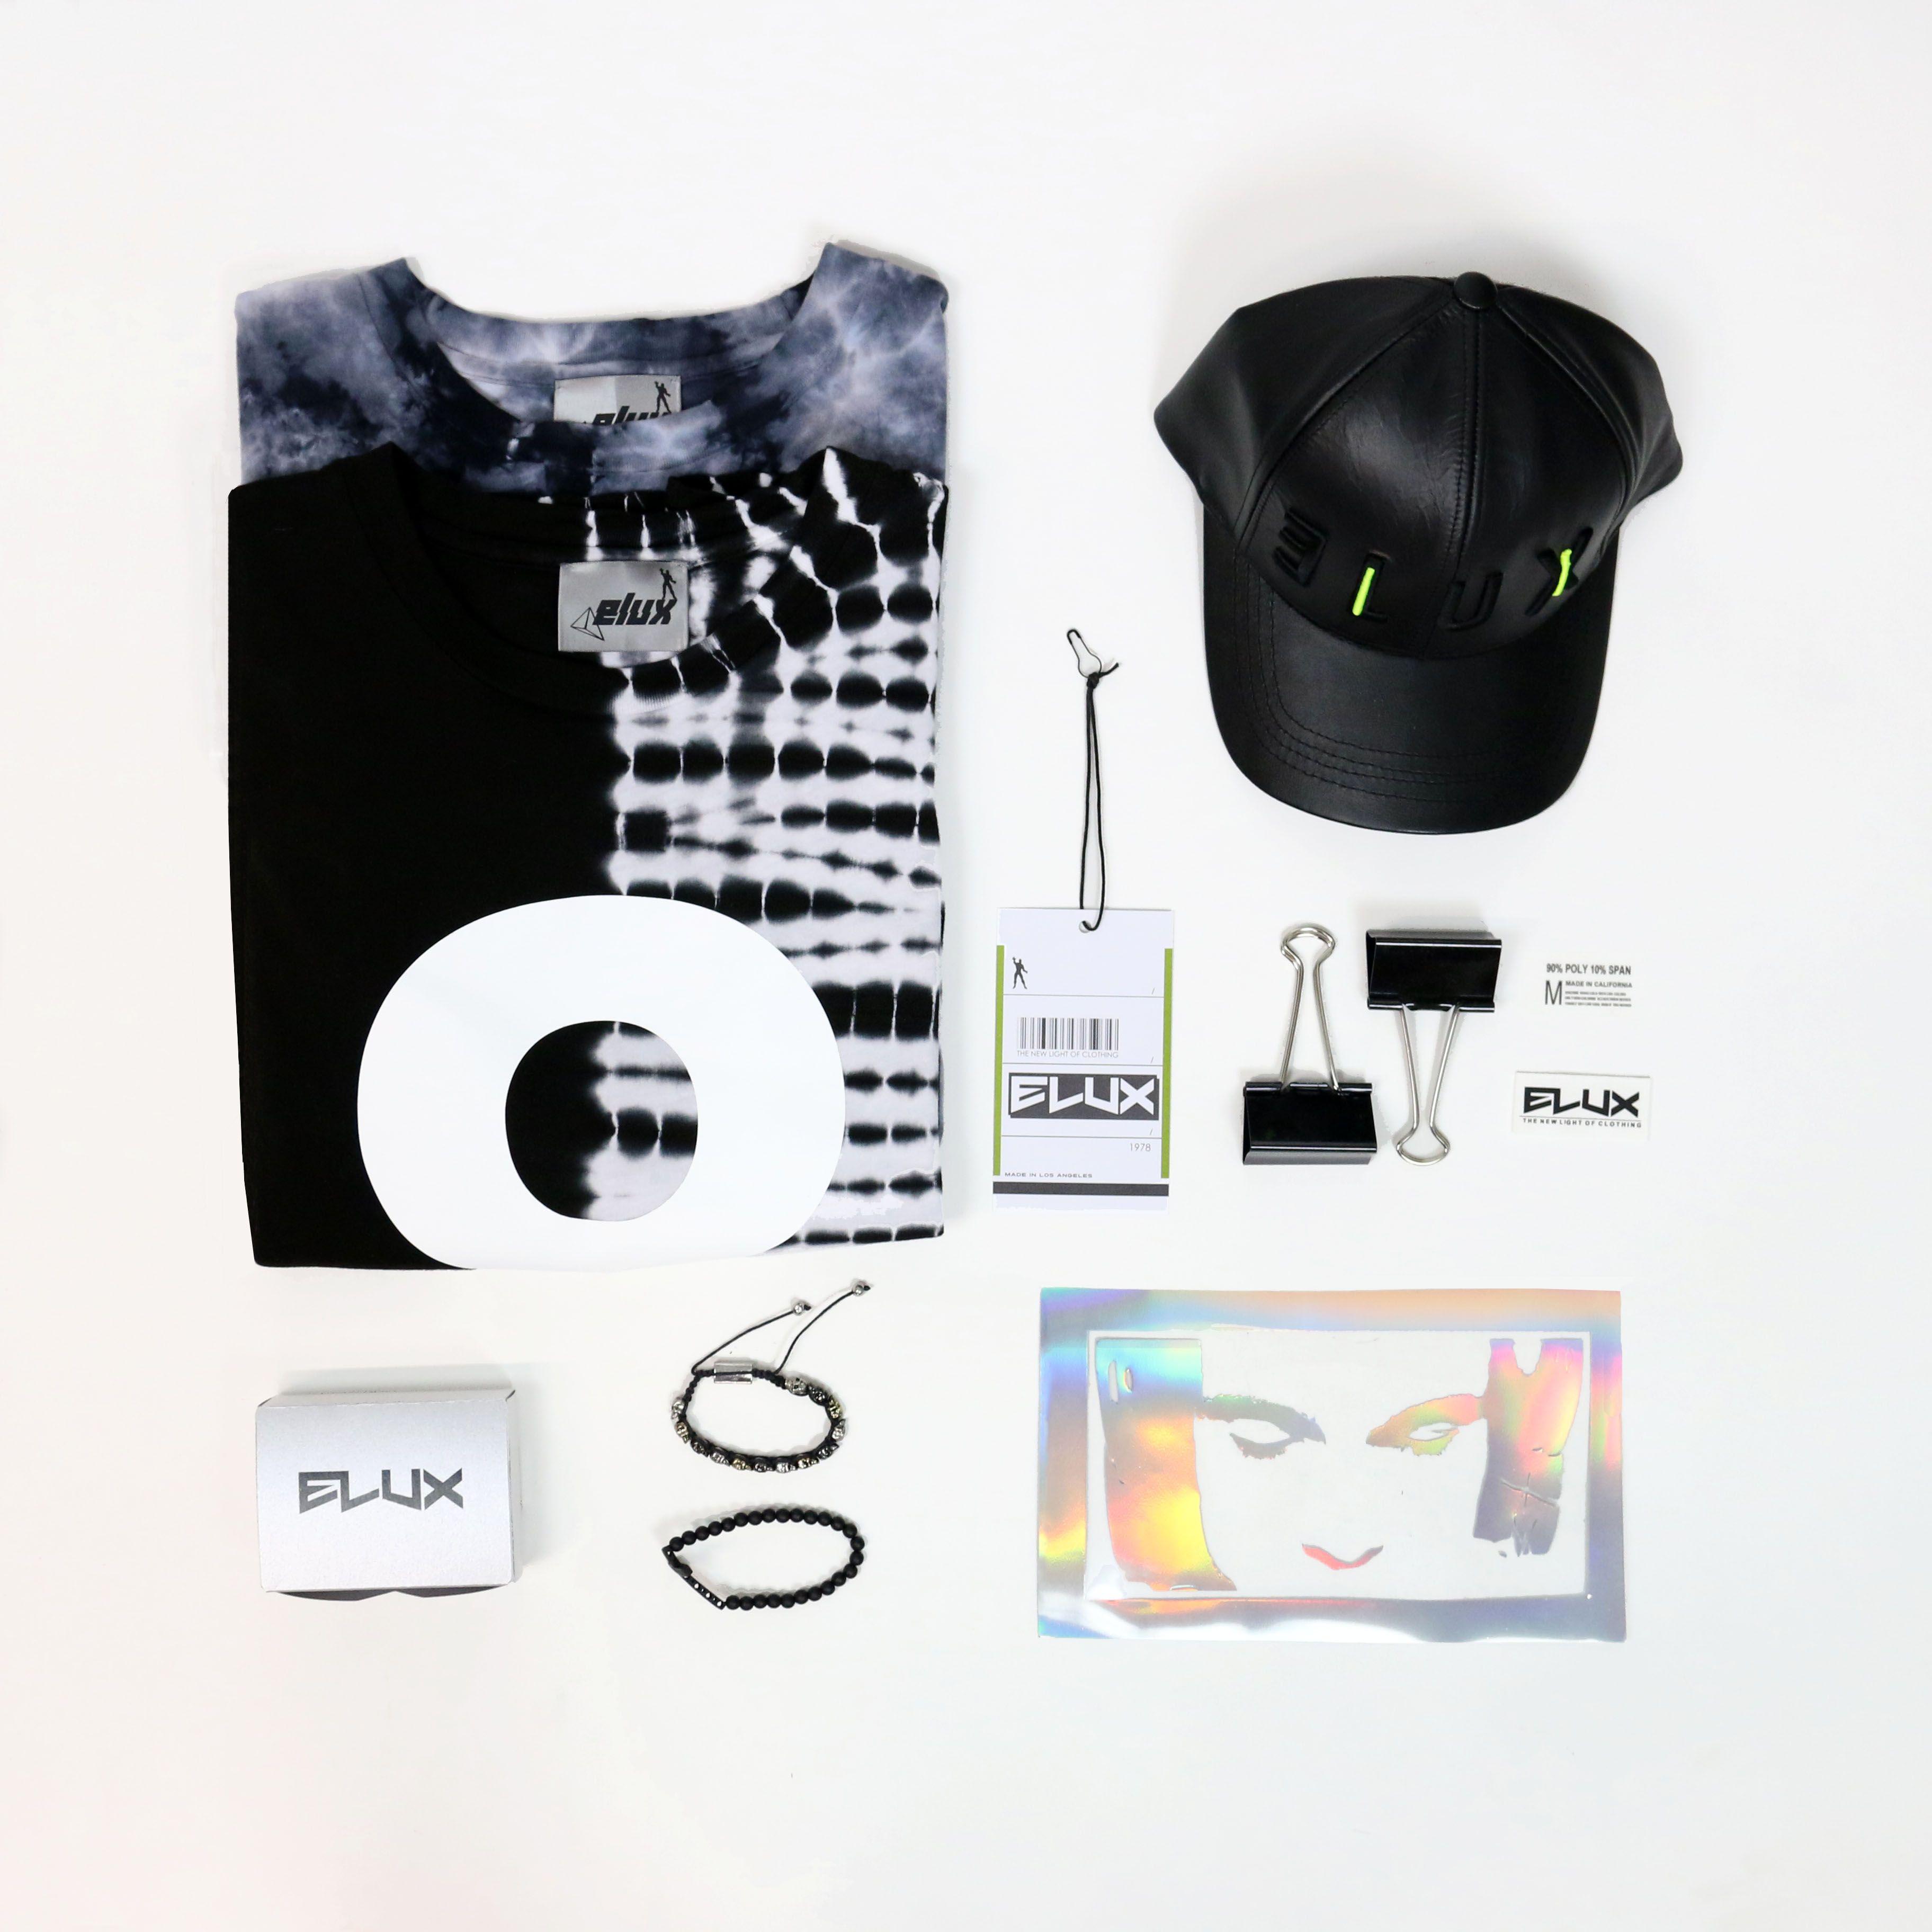 ELUX revolutionary streetwear embracing quality